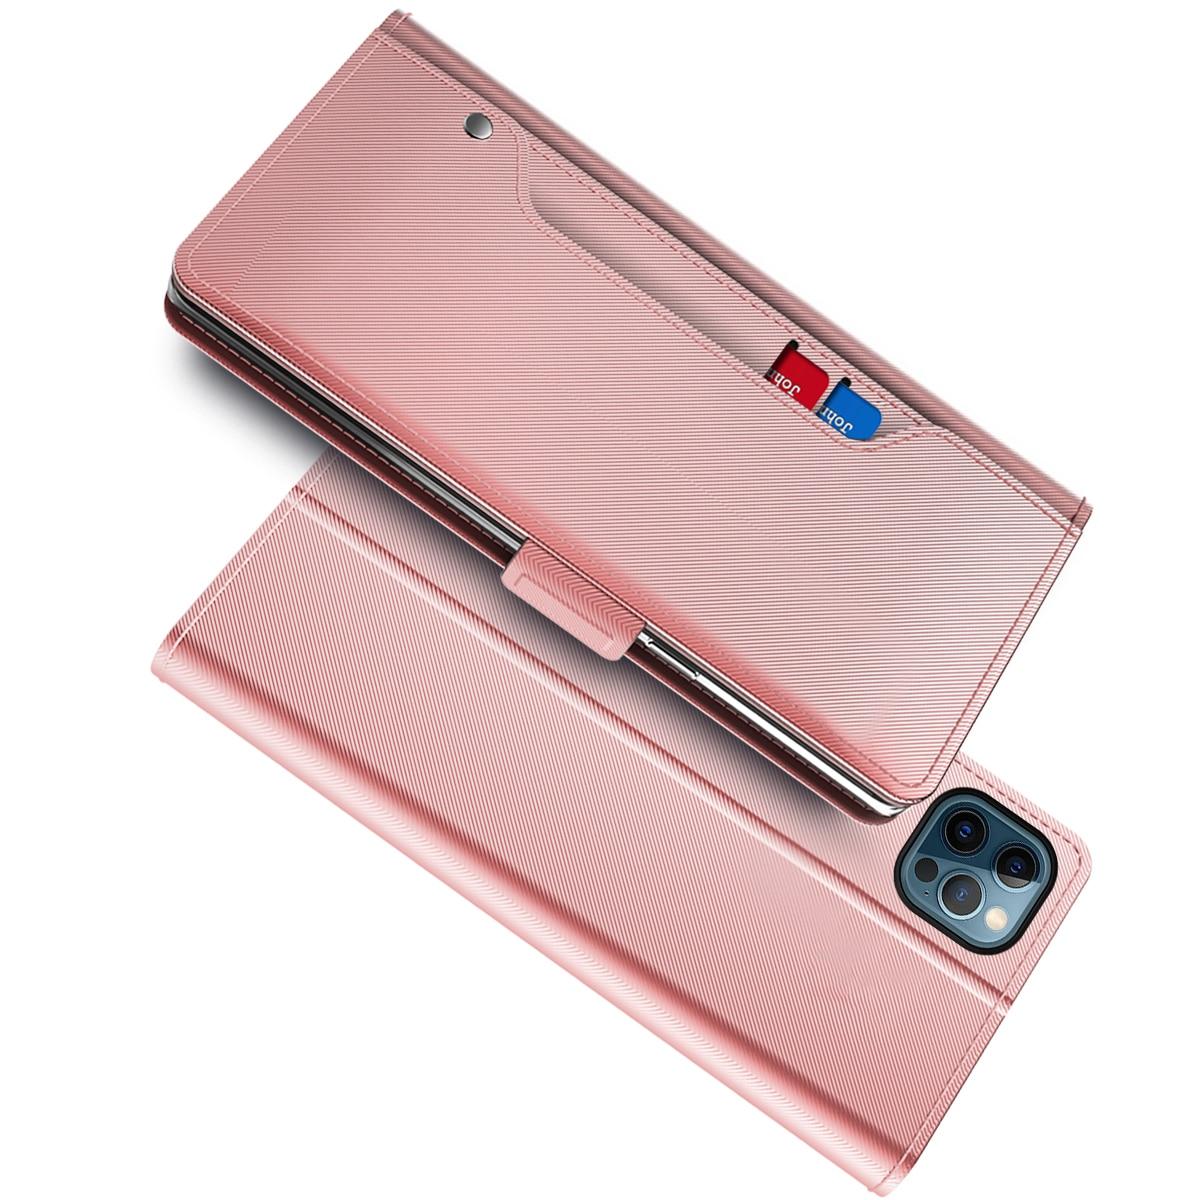 Lommebokdeksel Speil iPhone 13 Pro Max Rosa Gull